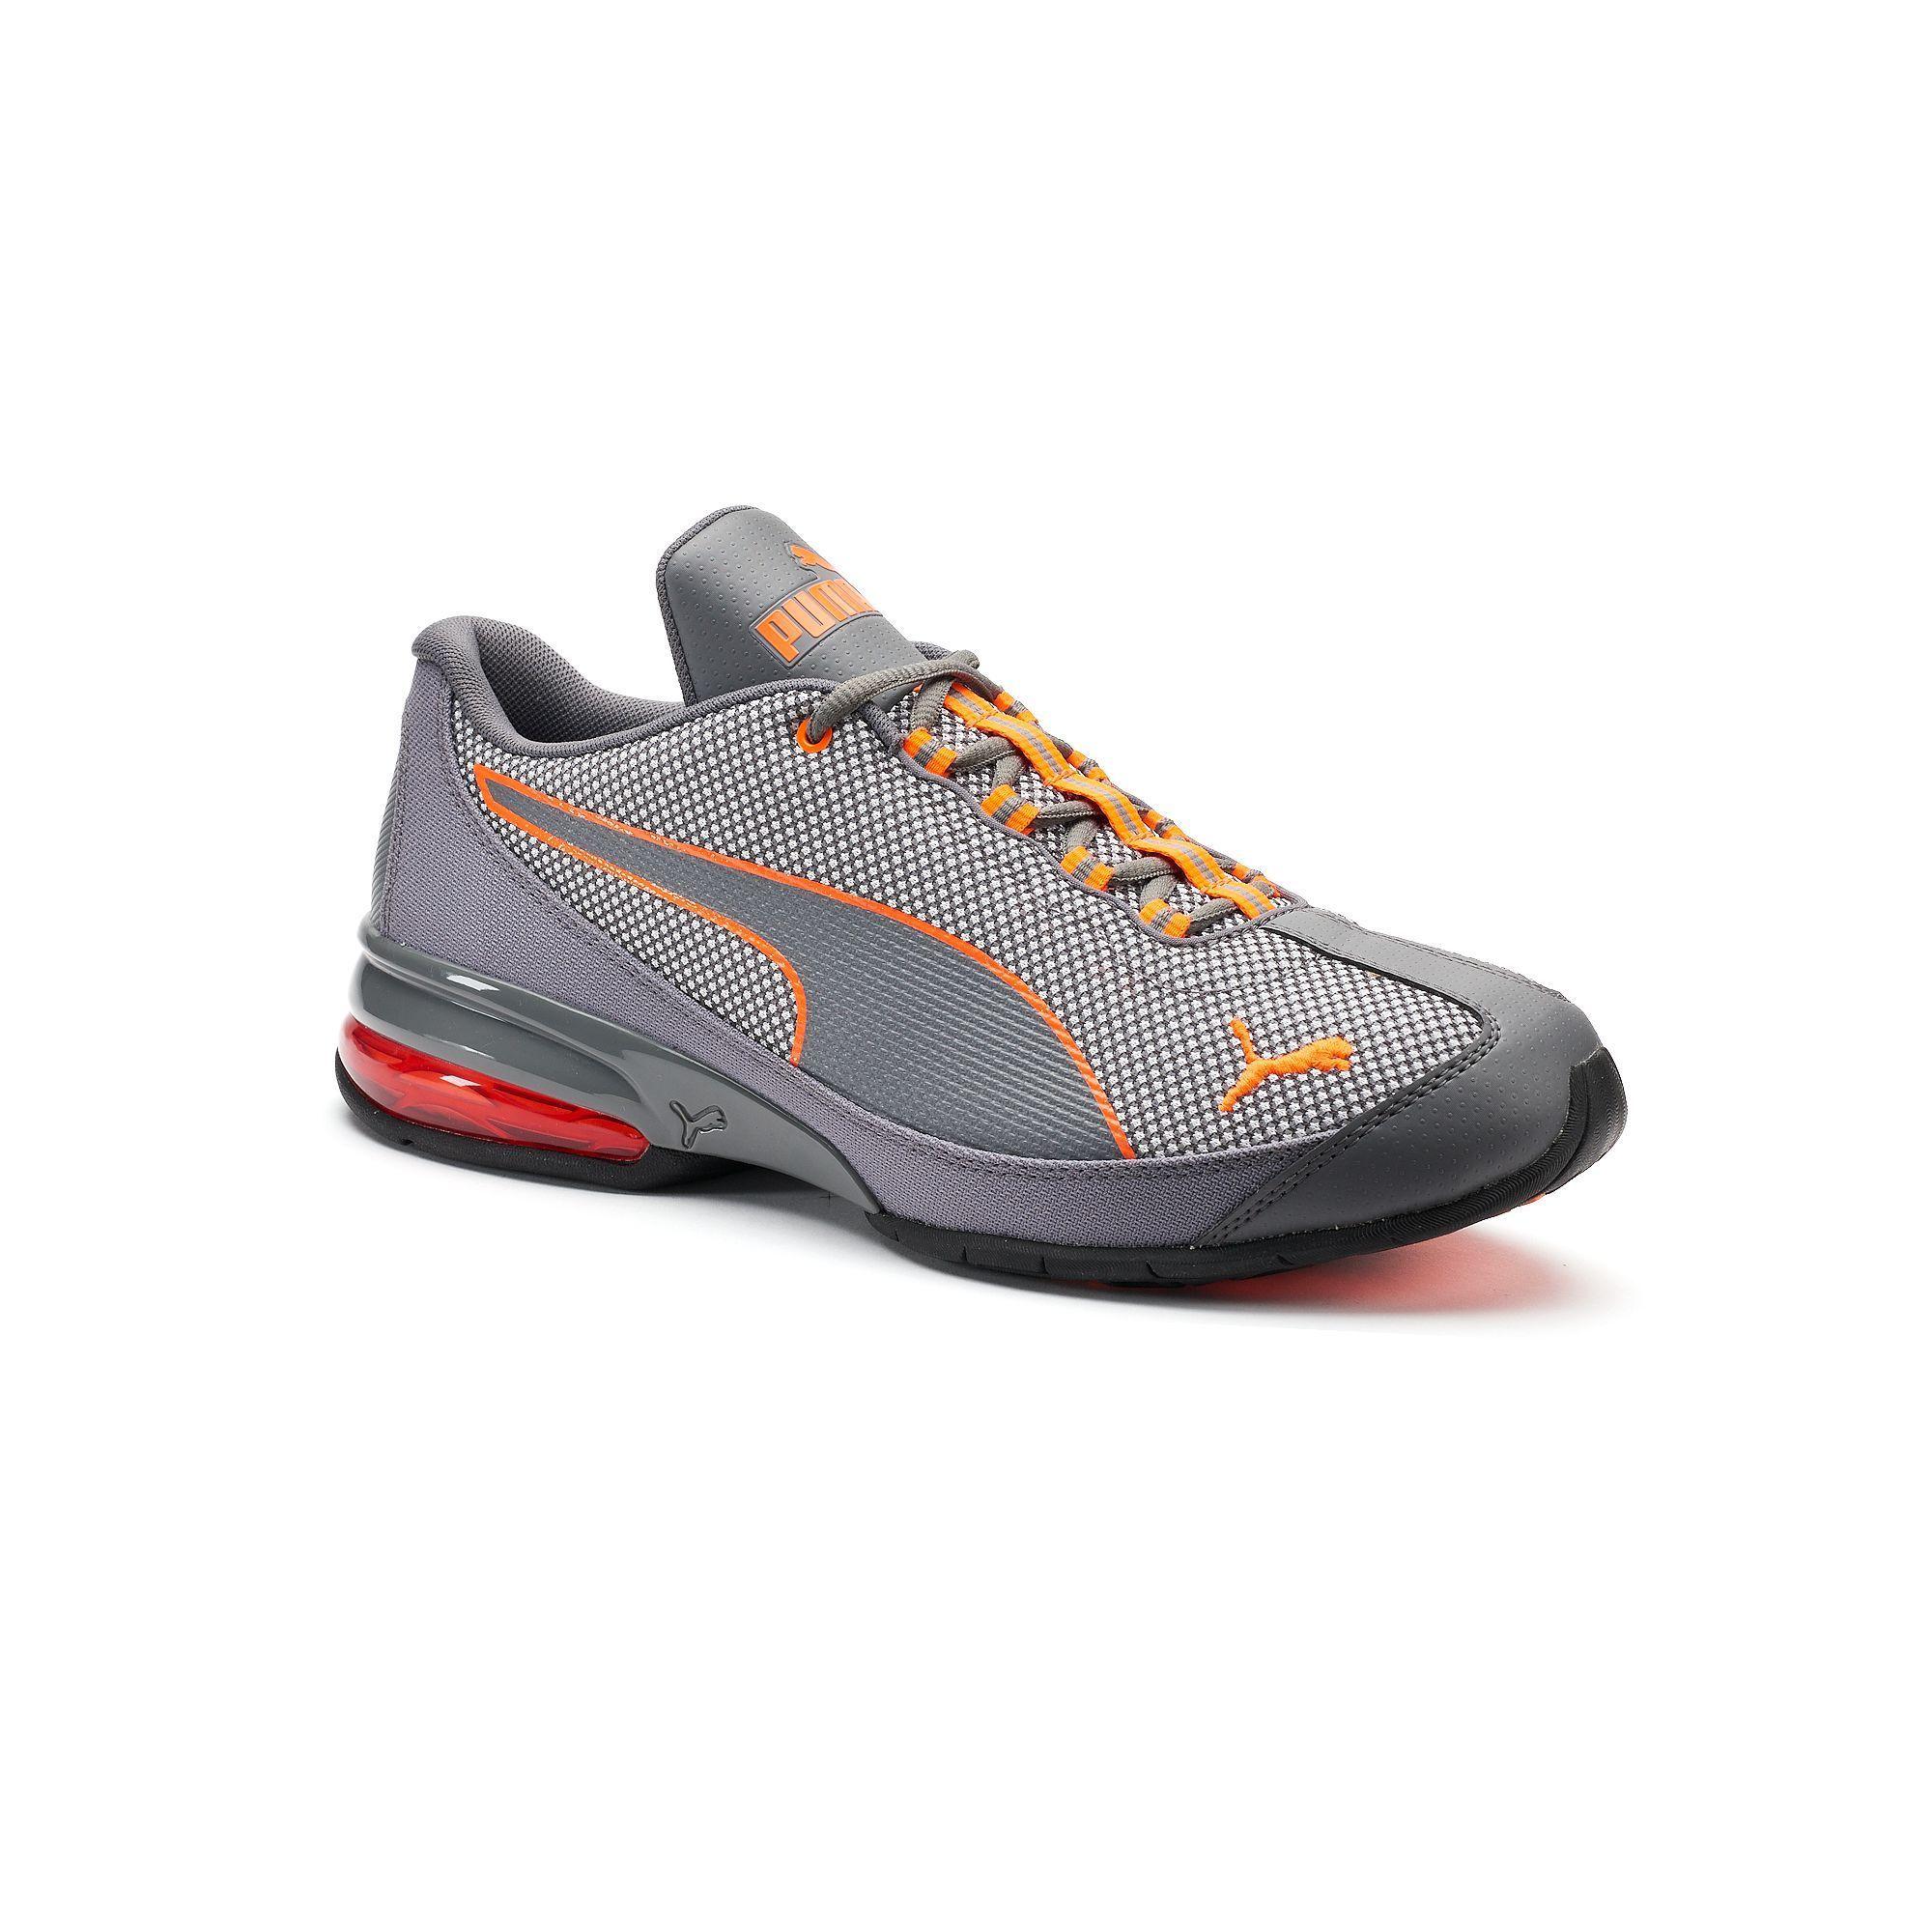 7c744b39ab99 PUMA Puma Reverb Knit Men s Running Shoes